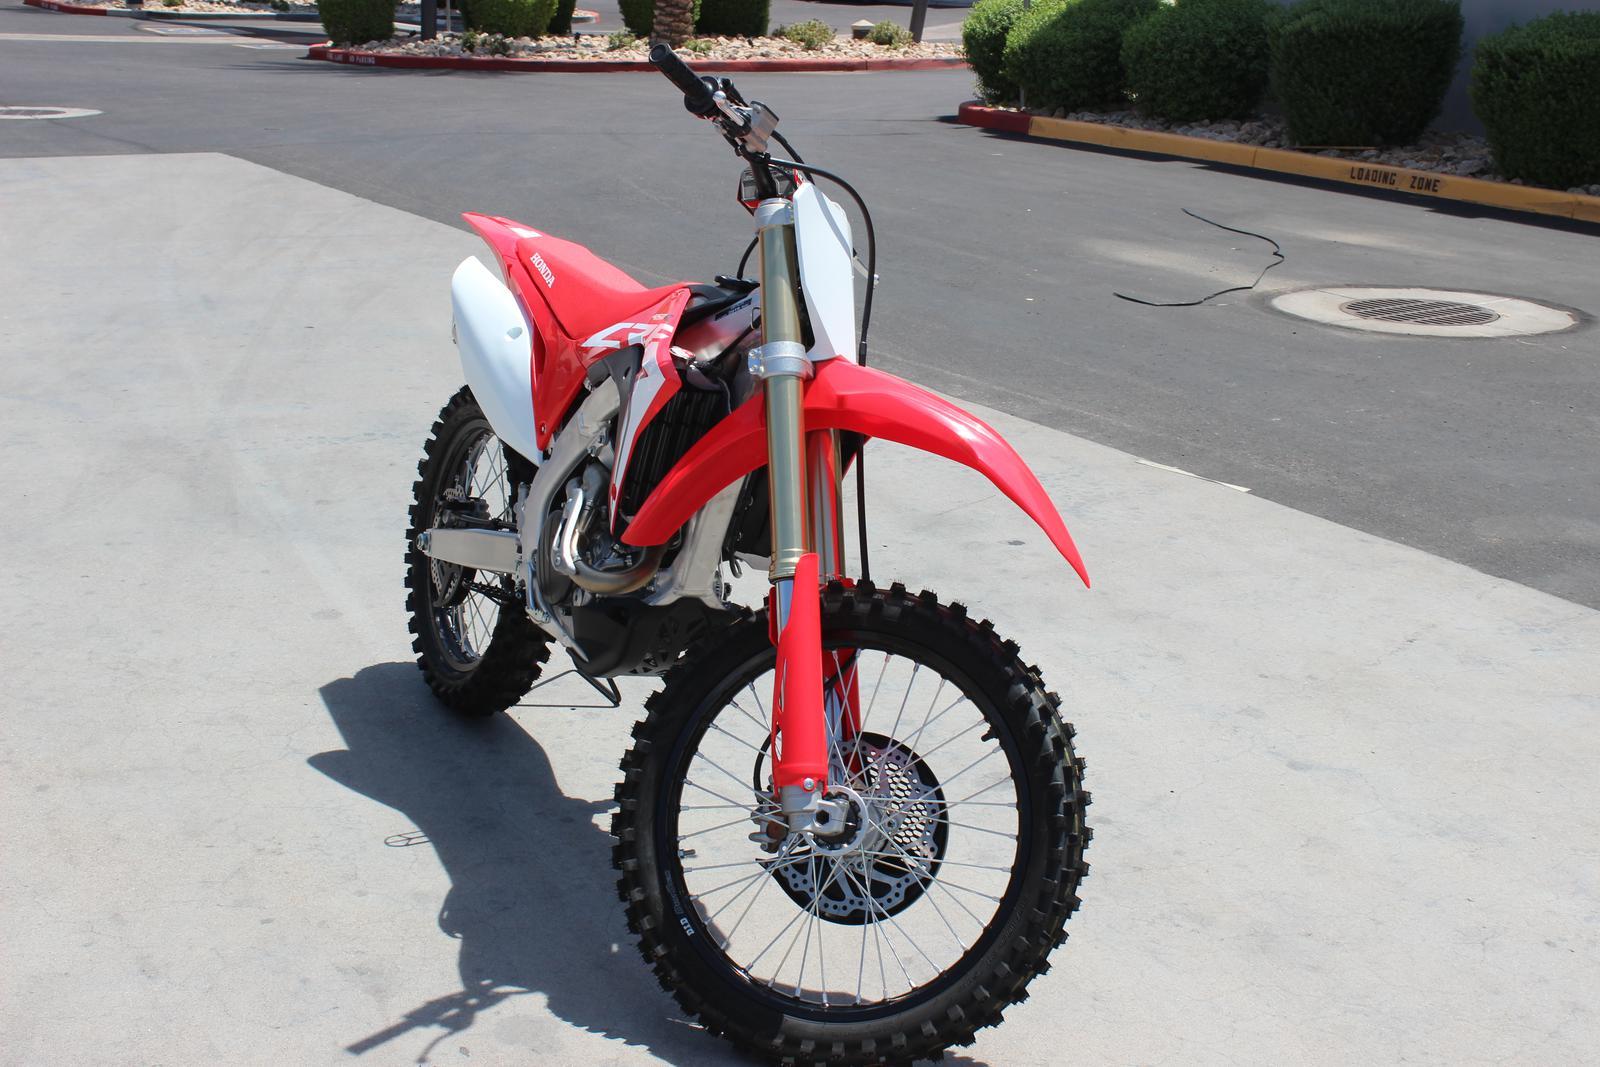 2019 Honda Crf450r For Sale In Scottsdale Az Go Az Motorcycles In